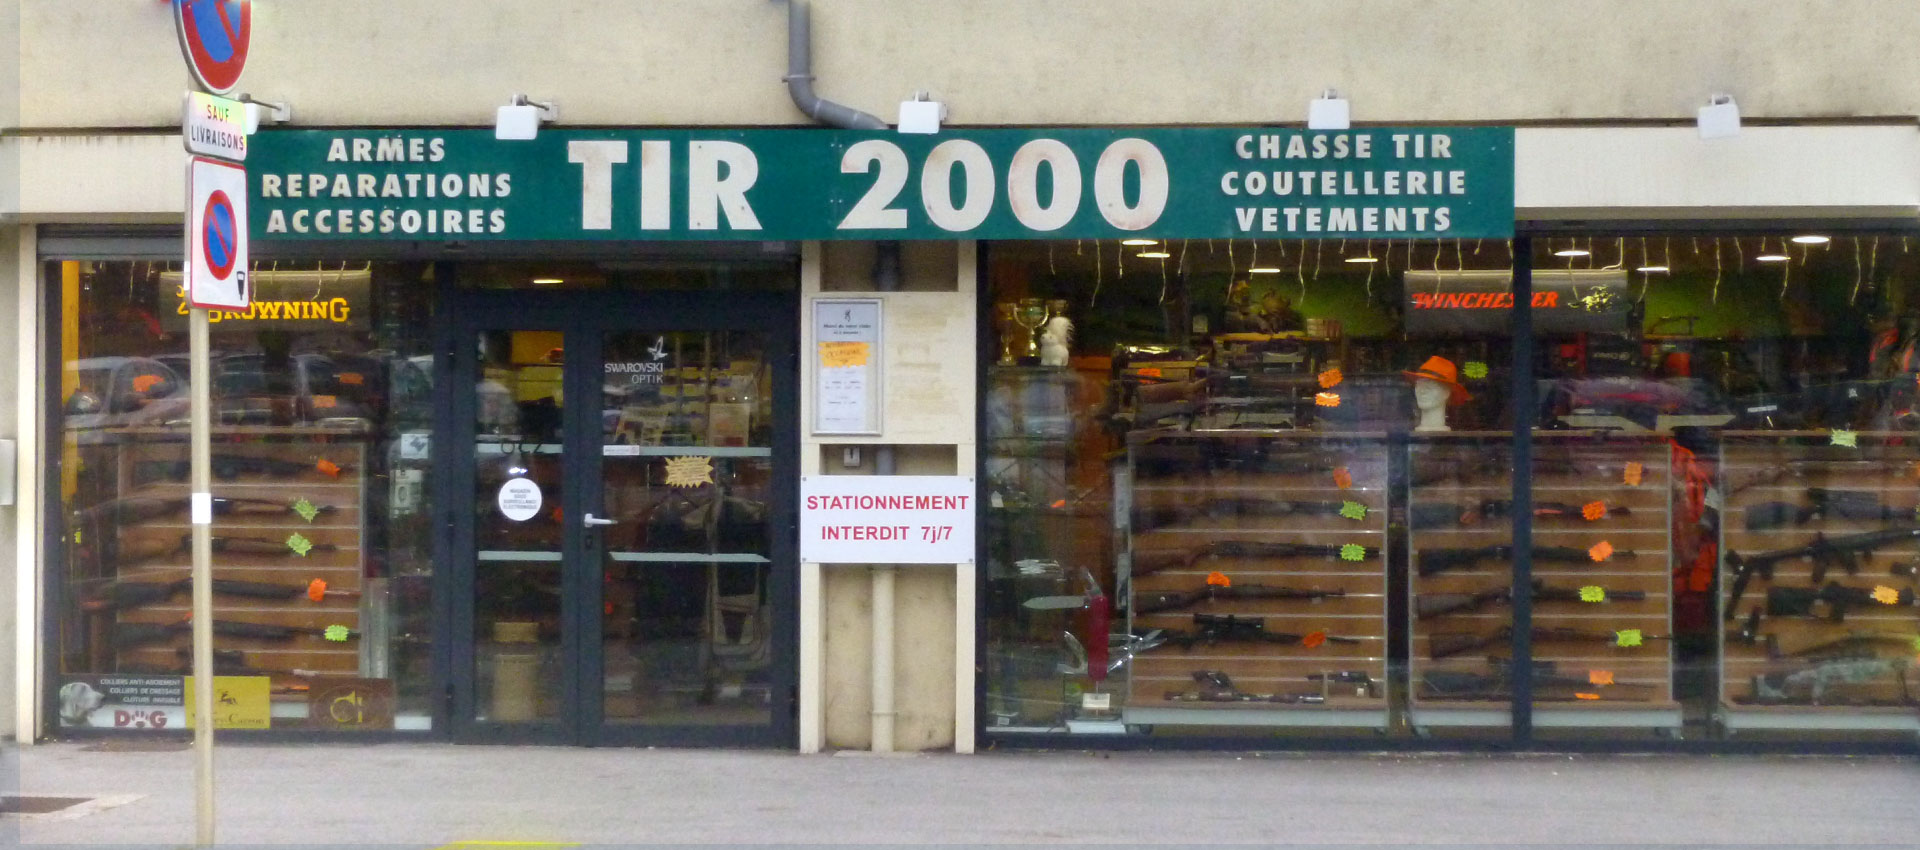 TIR 2000 armurerie coutellerie chasse tir Montbéliard